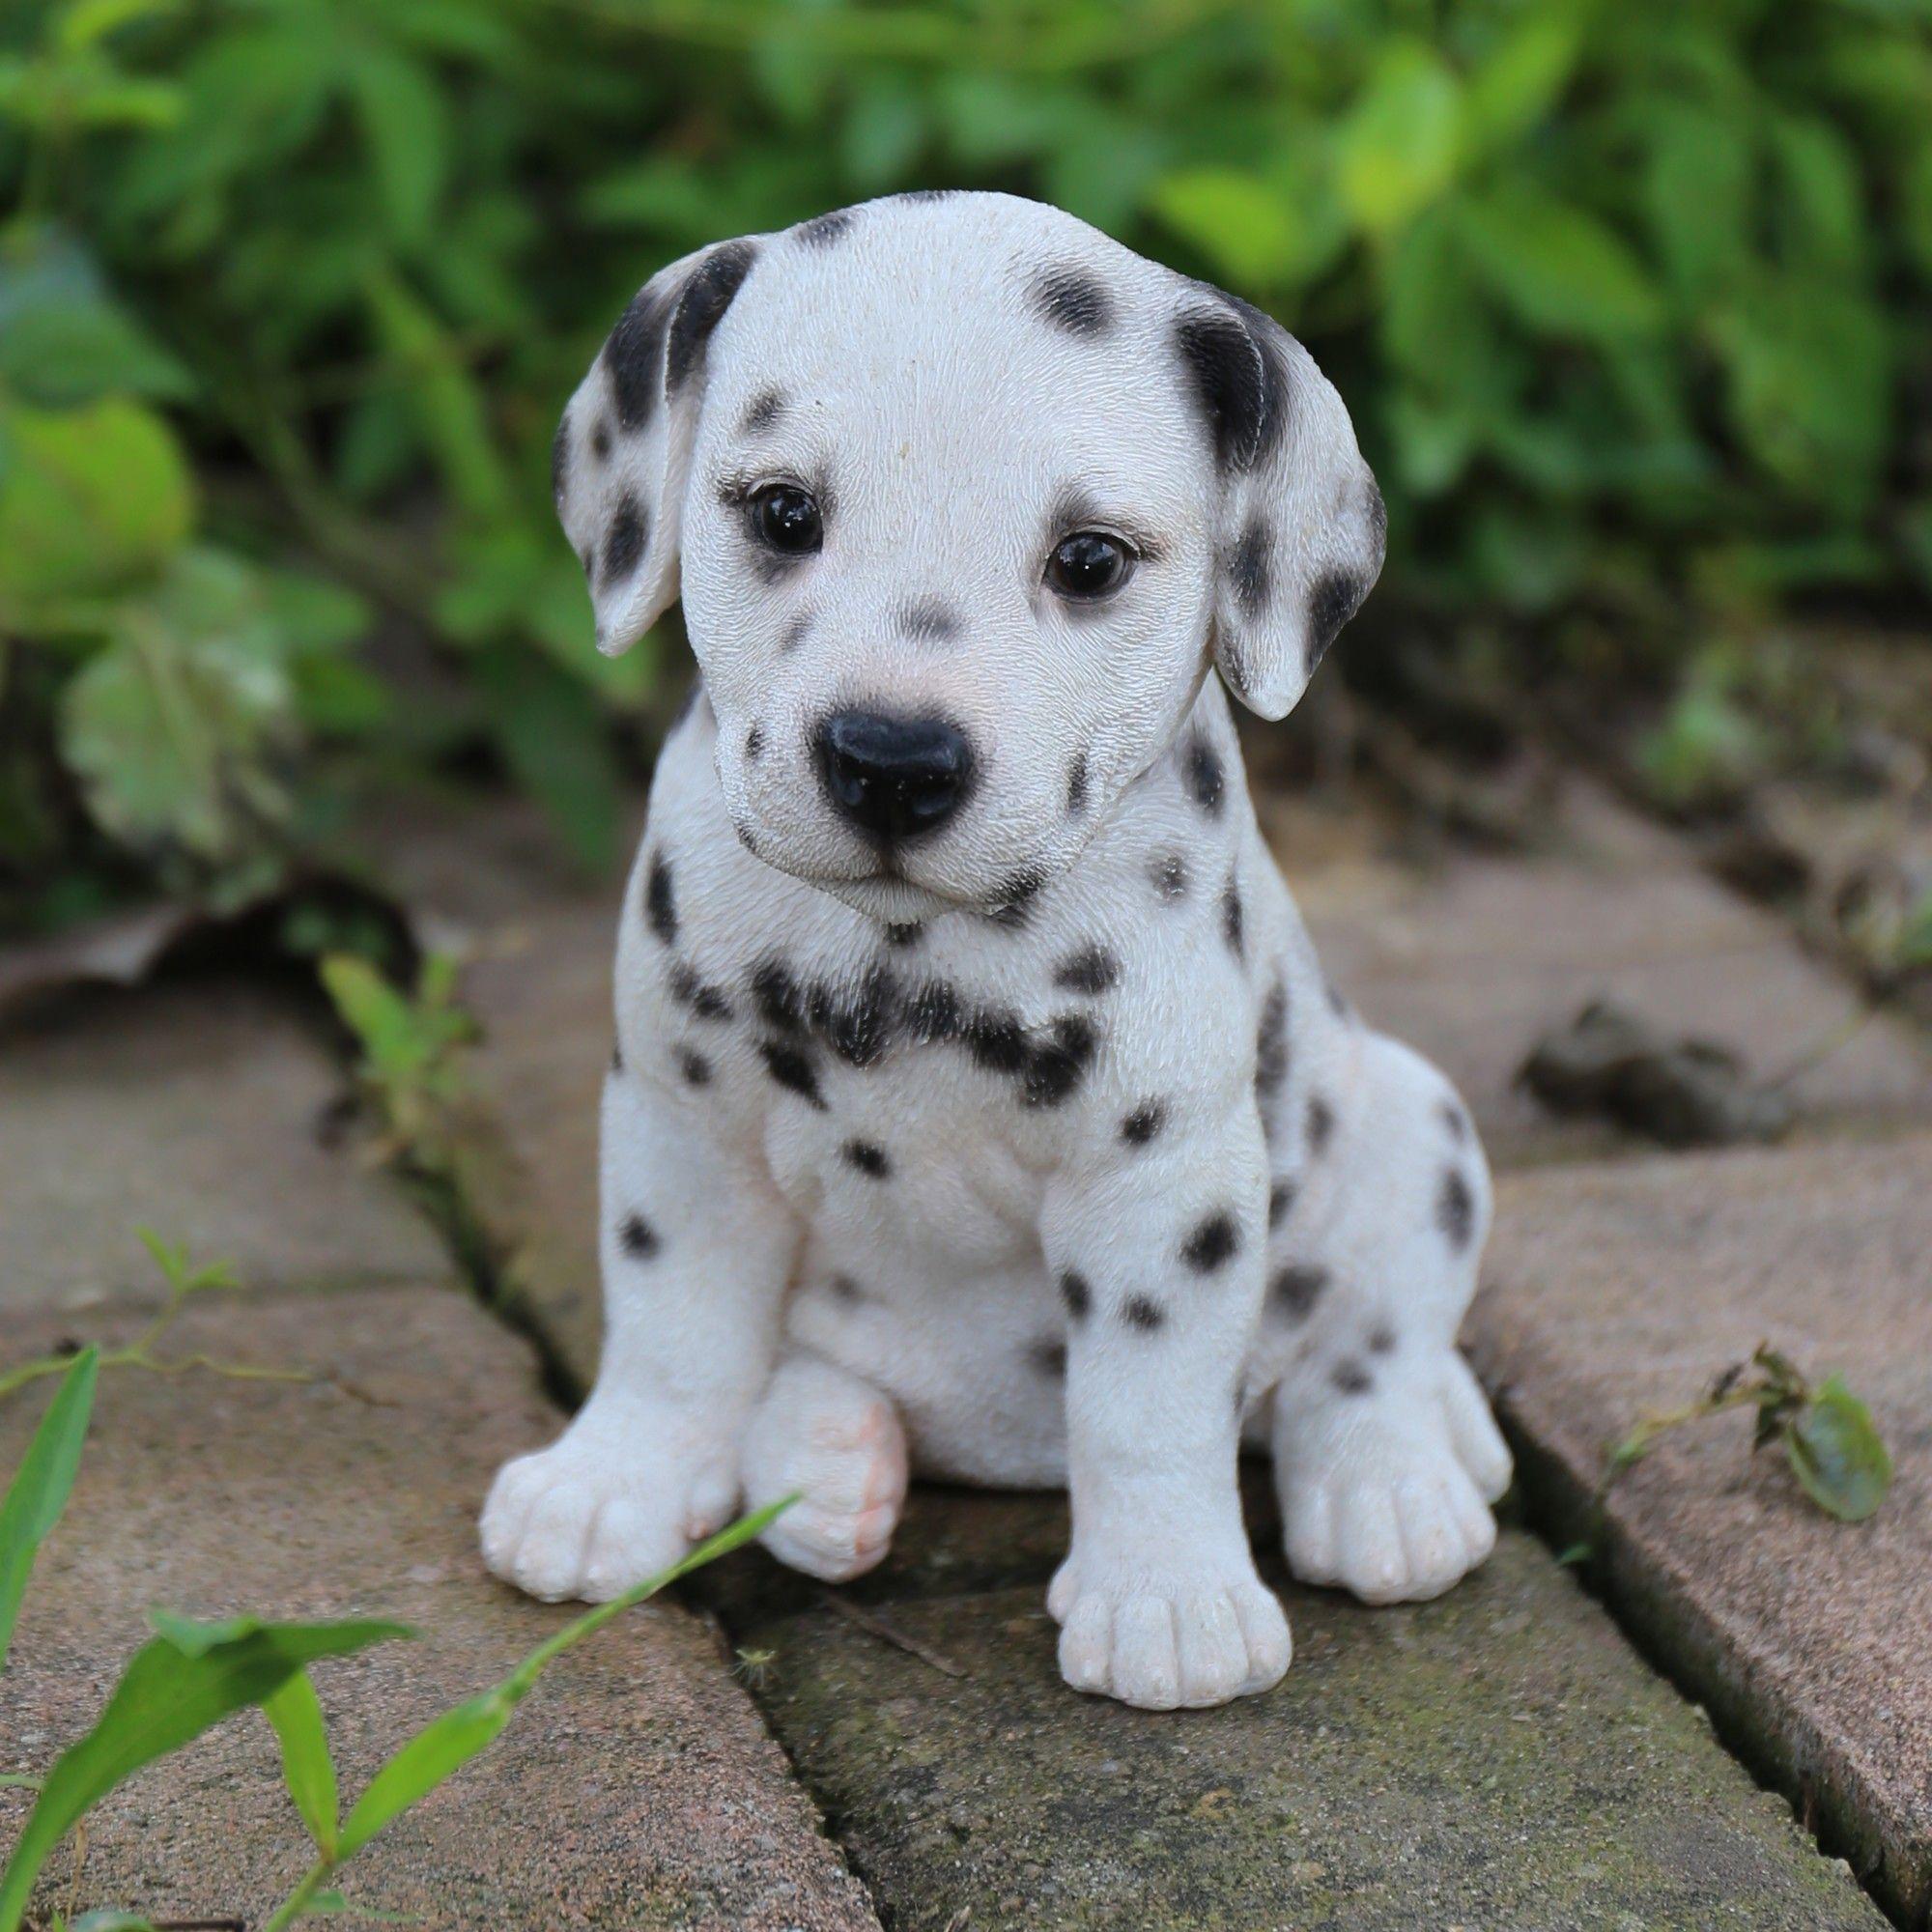 Dalmatian Puppy Statue | Fur Puppies | Cute animals ...